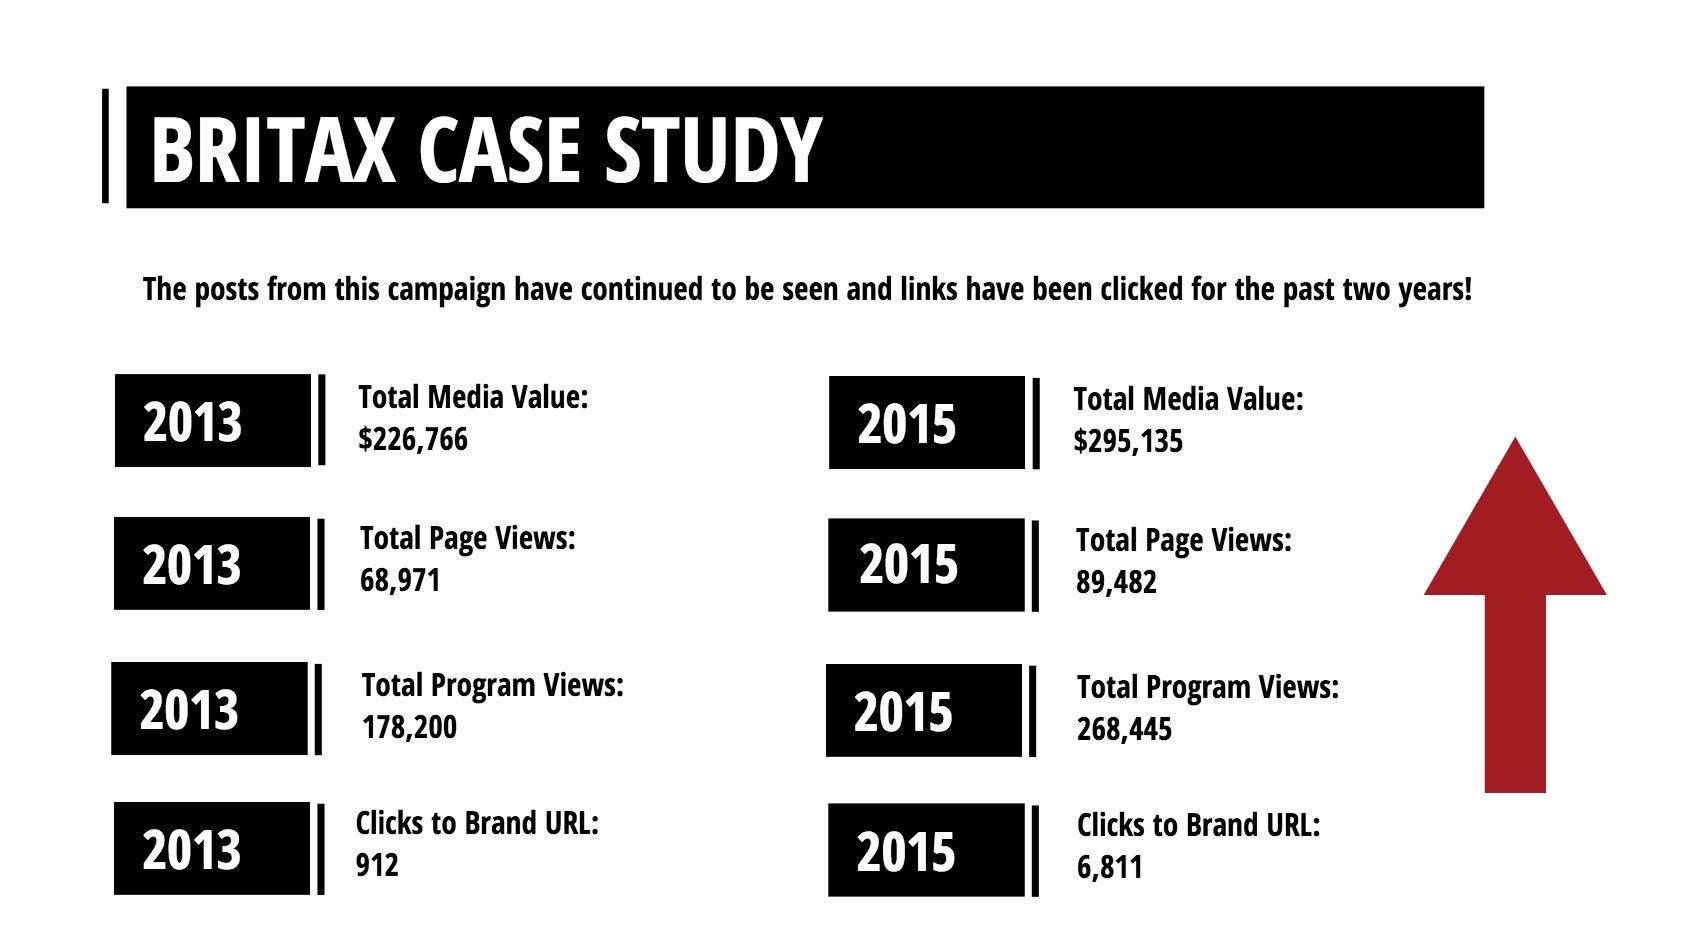 Britax Case Study